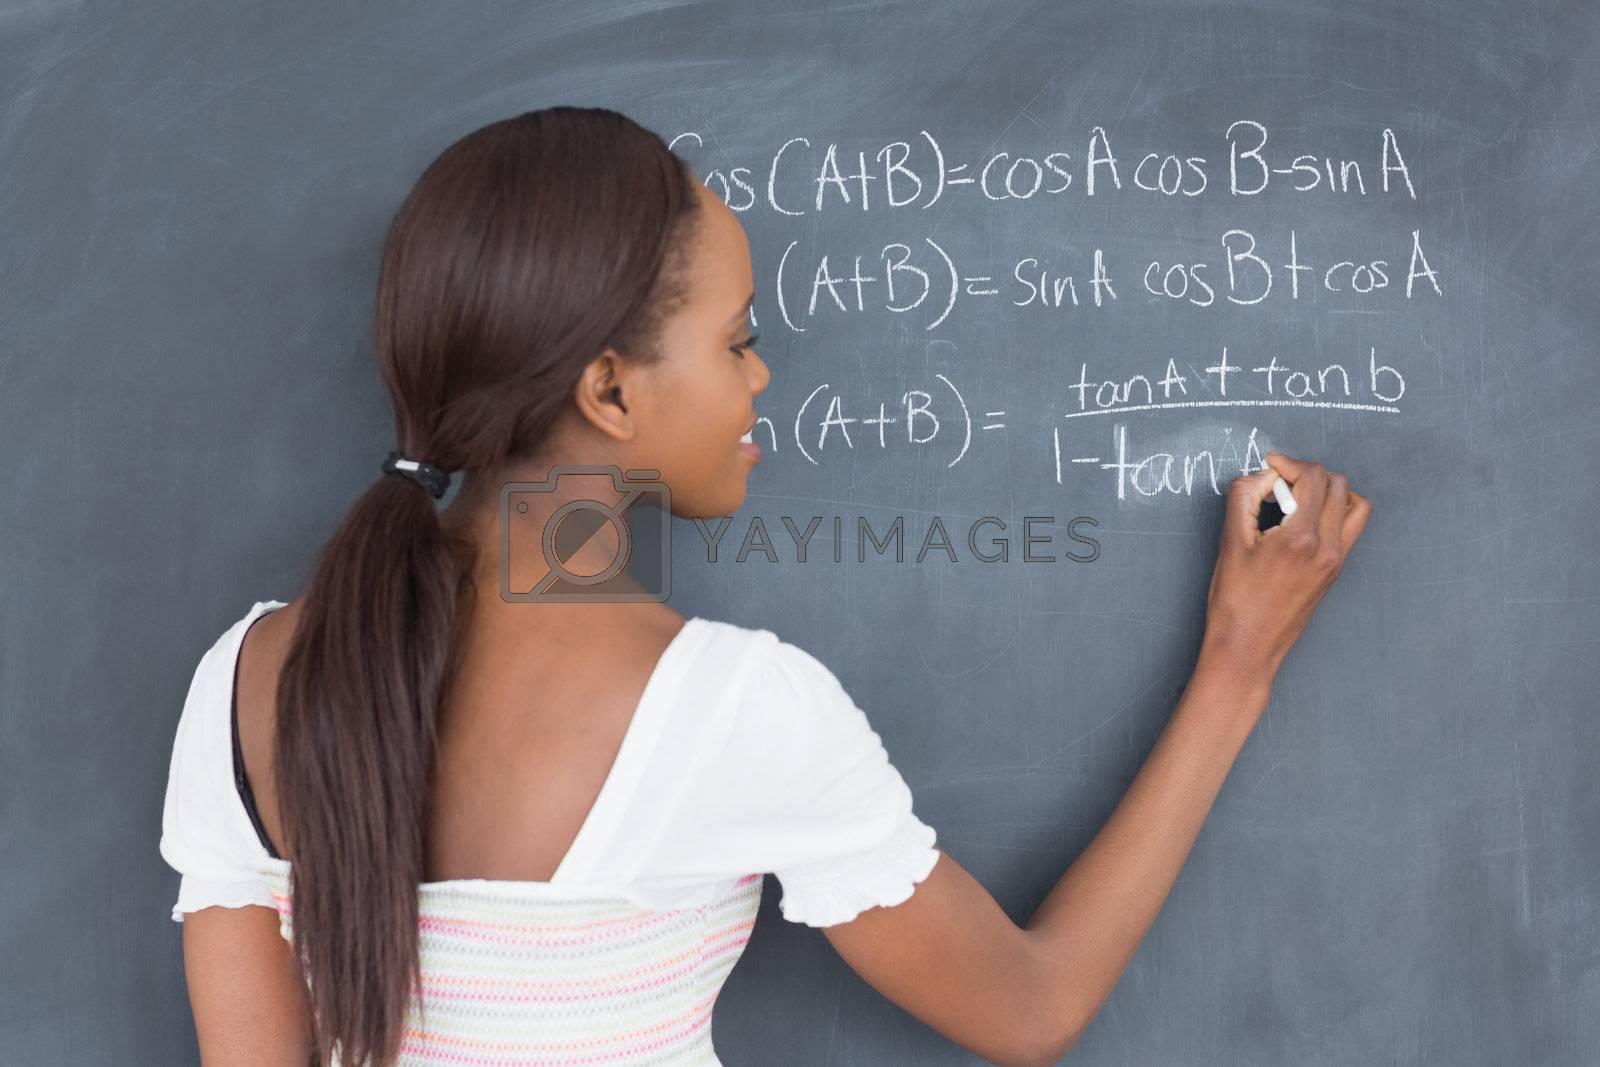 Black student writing on a blackboard in a classroom